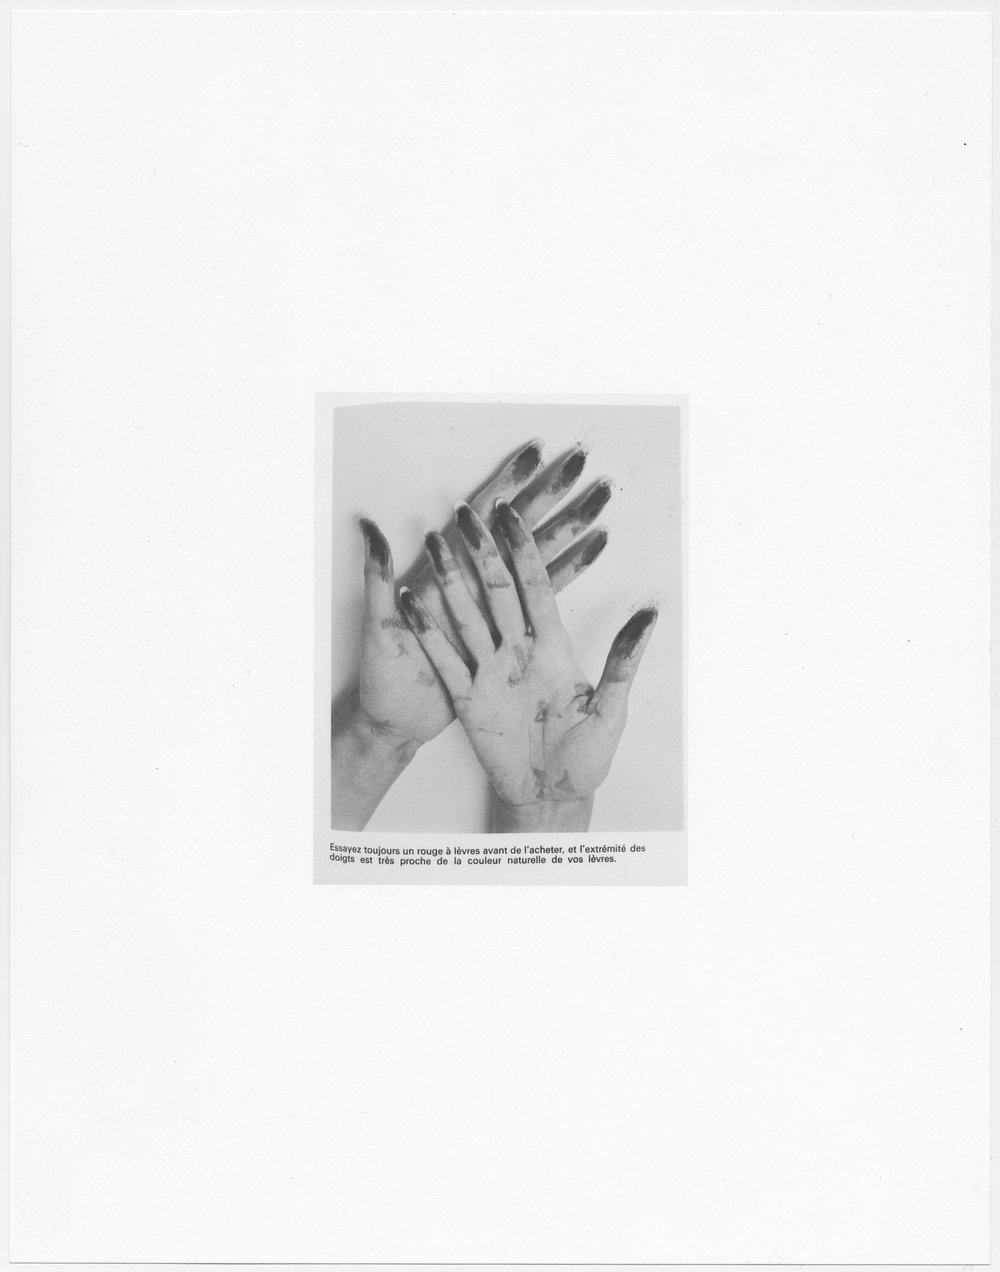 © Sophie Jodoin, %22elle commence ici 9%22, pastel et impression jet d'encre sur papier Stonehenge : charcoal and inkjet print on Stonehenge paper, 35,5 x 28 cm, 2015. Courtesy Galerie C.jpg